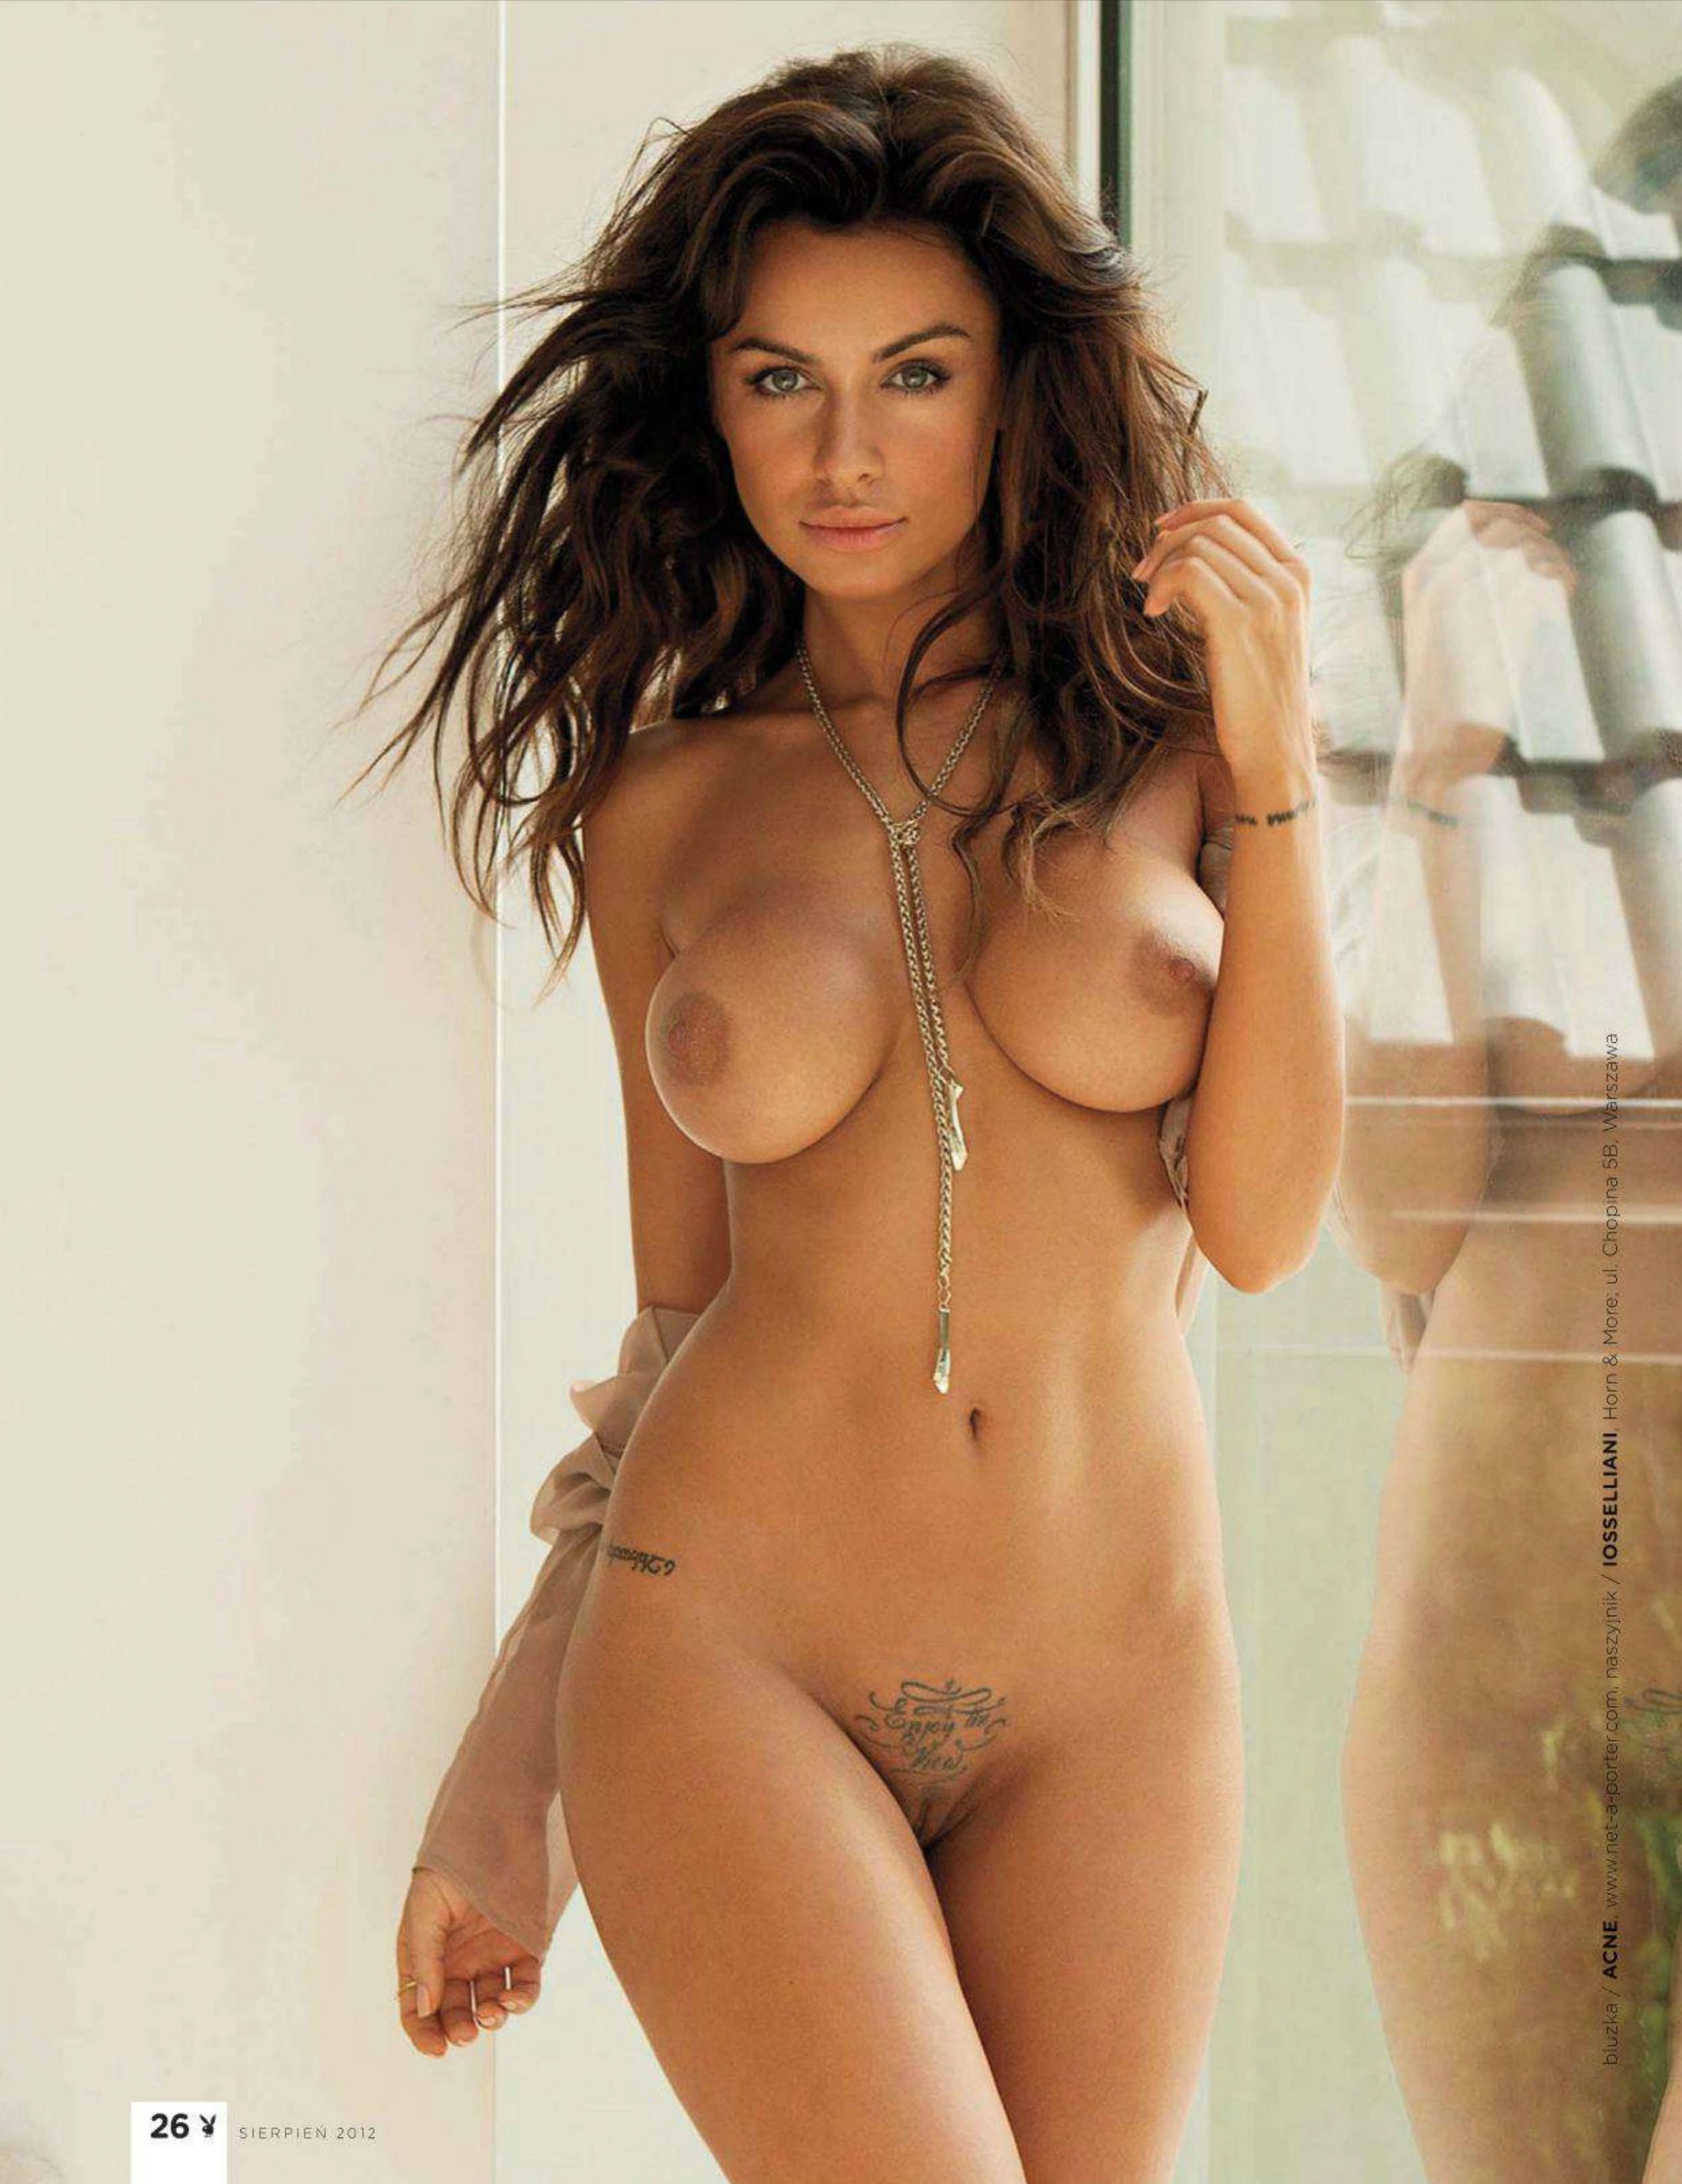 Natalia Siwiec fotos desnuda hackeadas